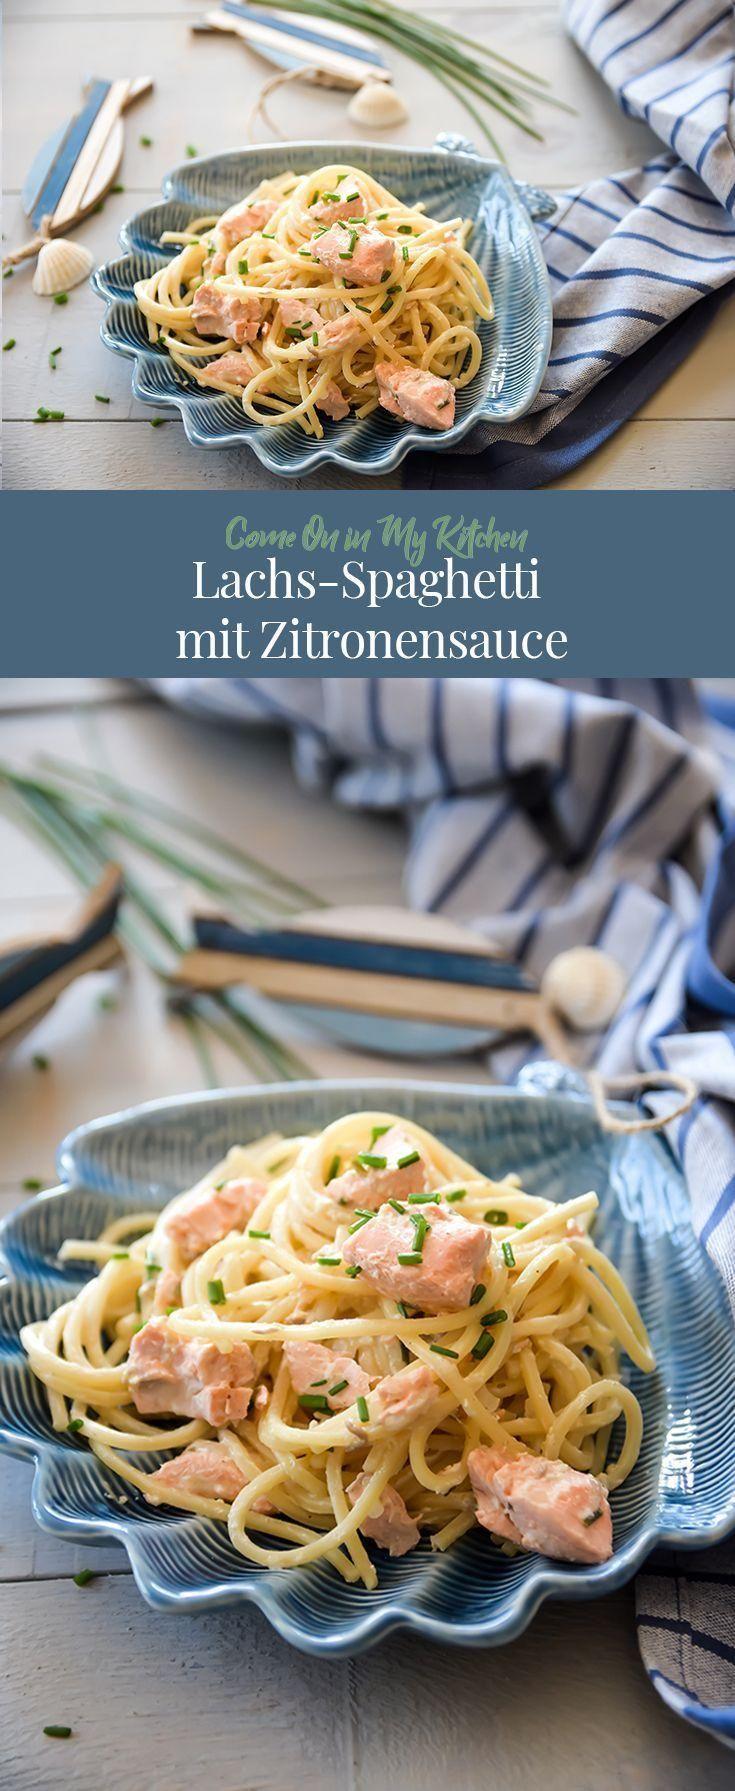 Salmon spaghetti with lemon sauce  Rezepte für Pasta  Nudeln